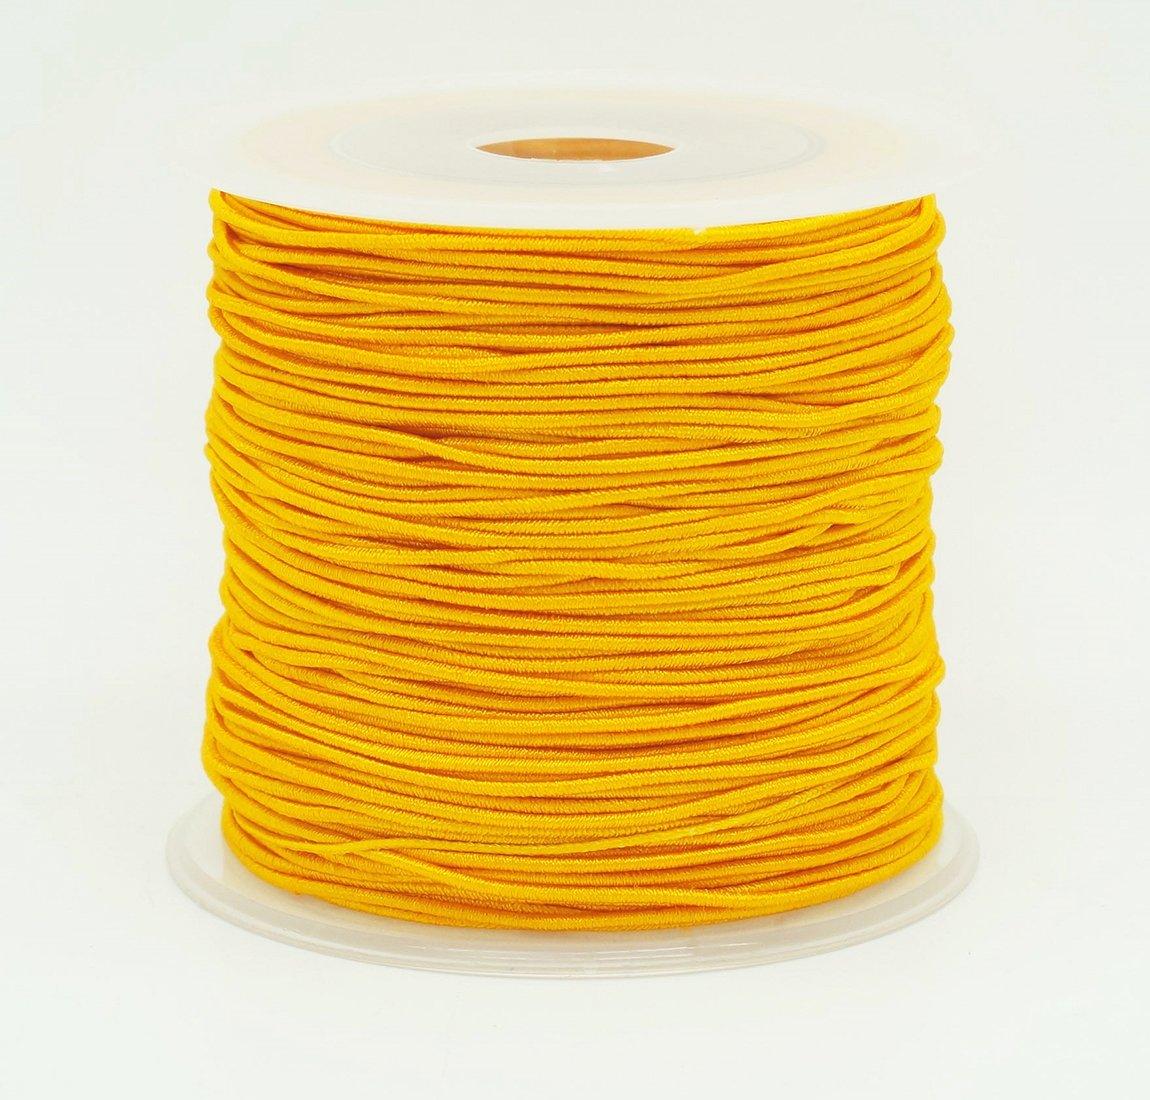 GOLDEN YELLOW 0.8mm Nylon Coated Round Elastic Cord Stretch Beading Mala String (75yards Spool)